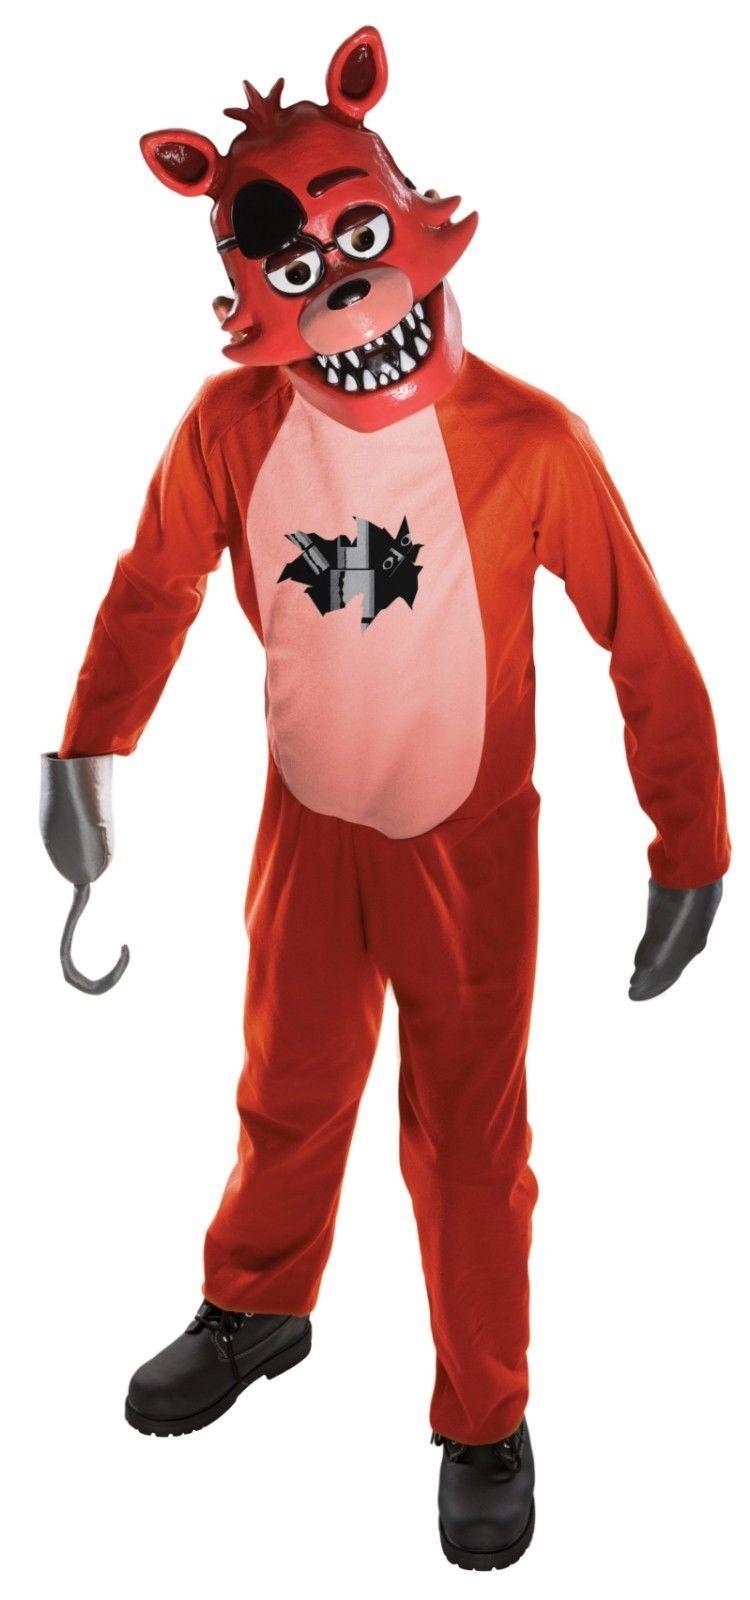 Rubies Five Nights At Freddy's Foxy Tween Child Boys Halloween Costume 630103